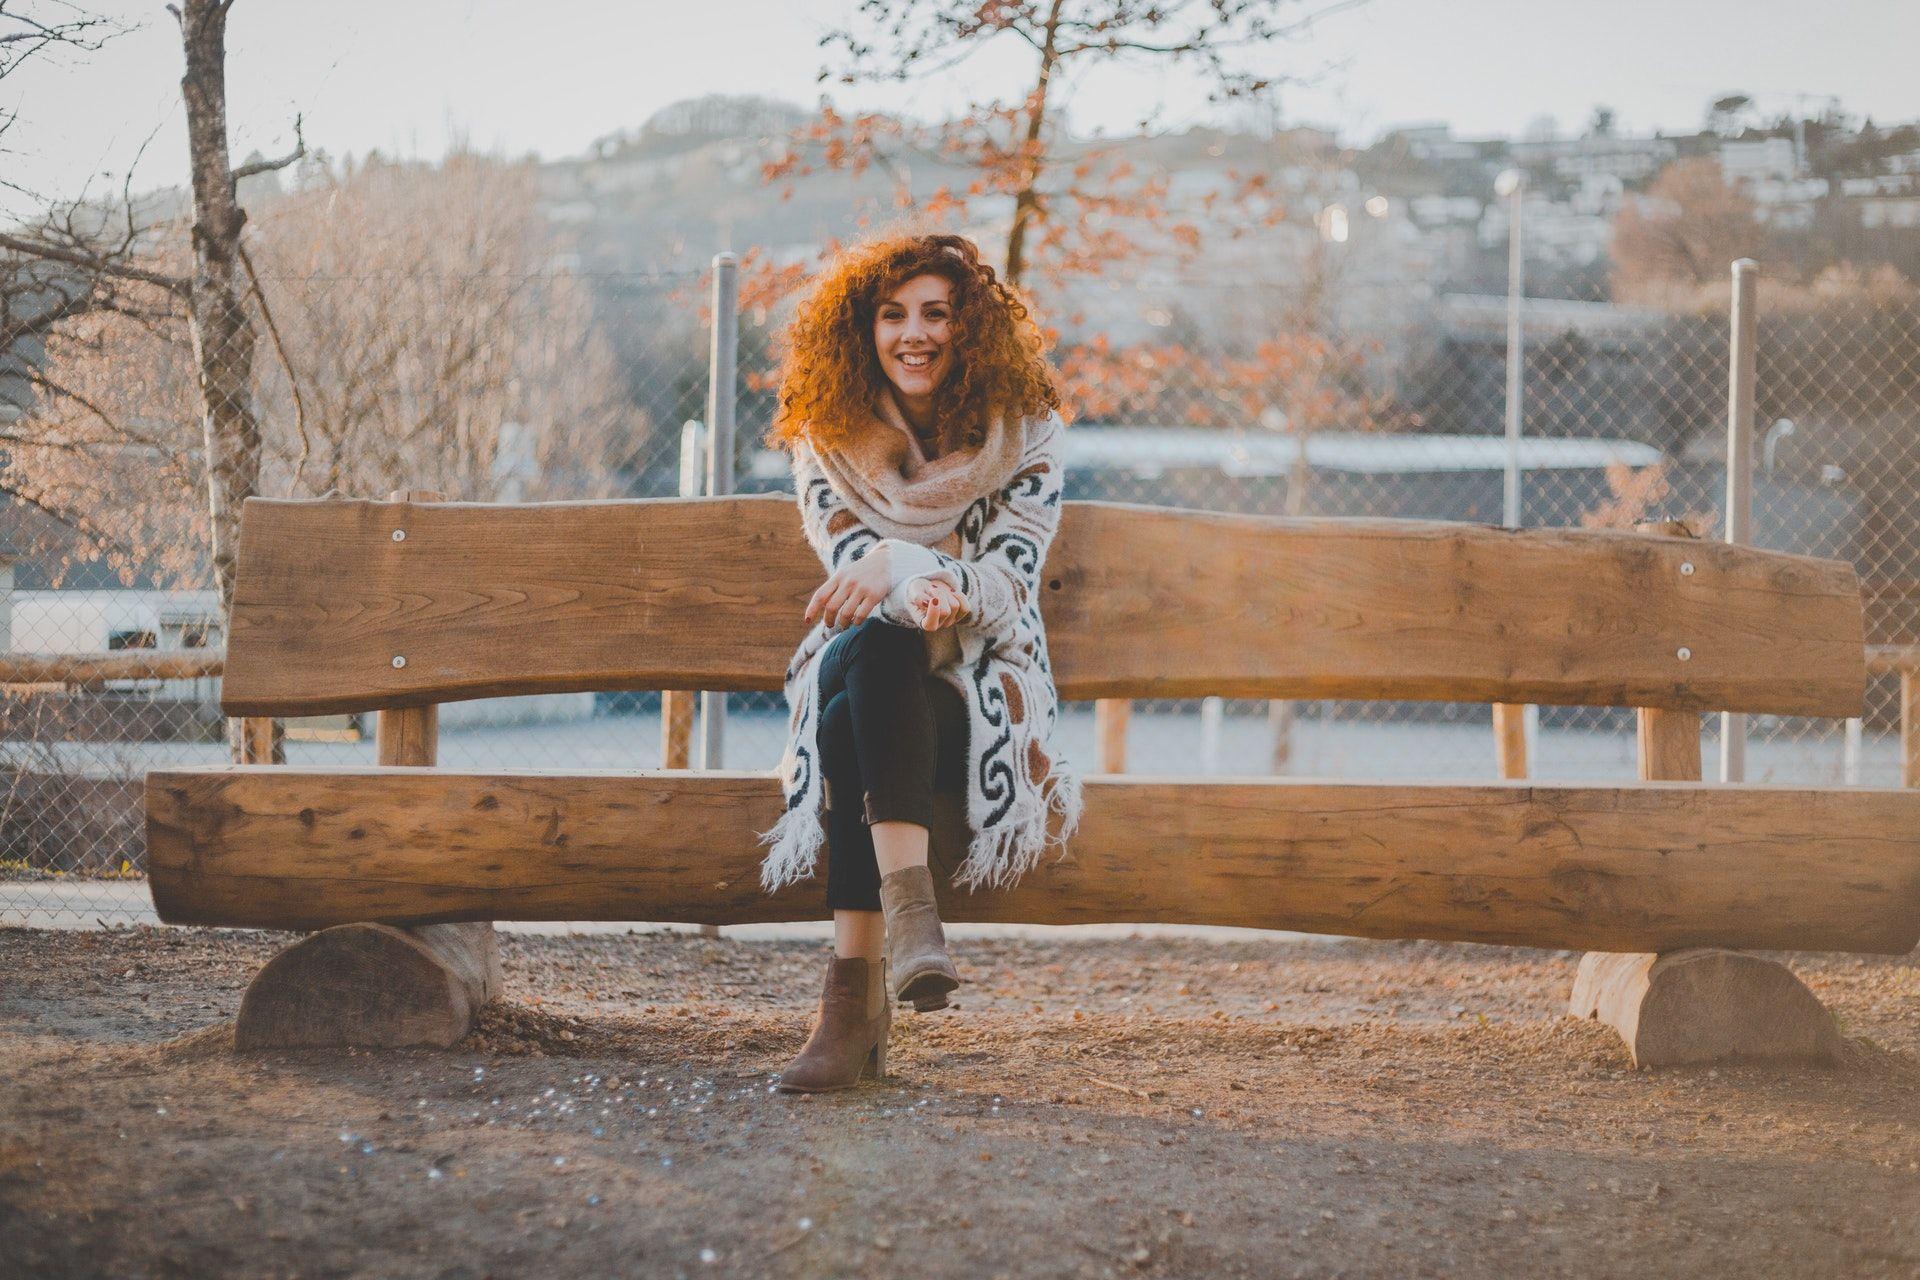 Bikin Hidup Lebih Damai, Ini 10 Cara Mudah Memaafkan Diri Sendiri